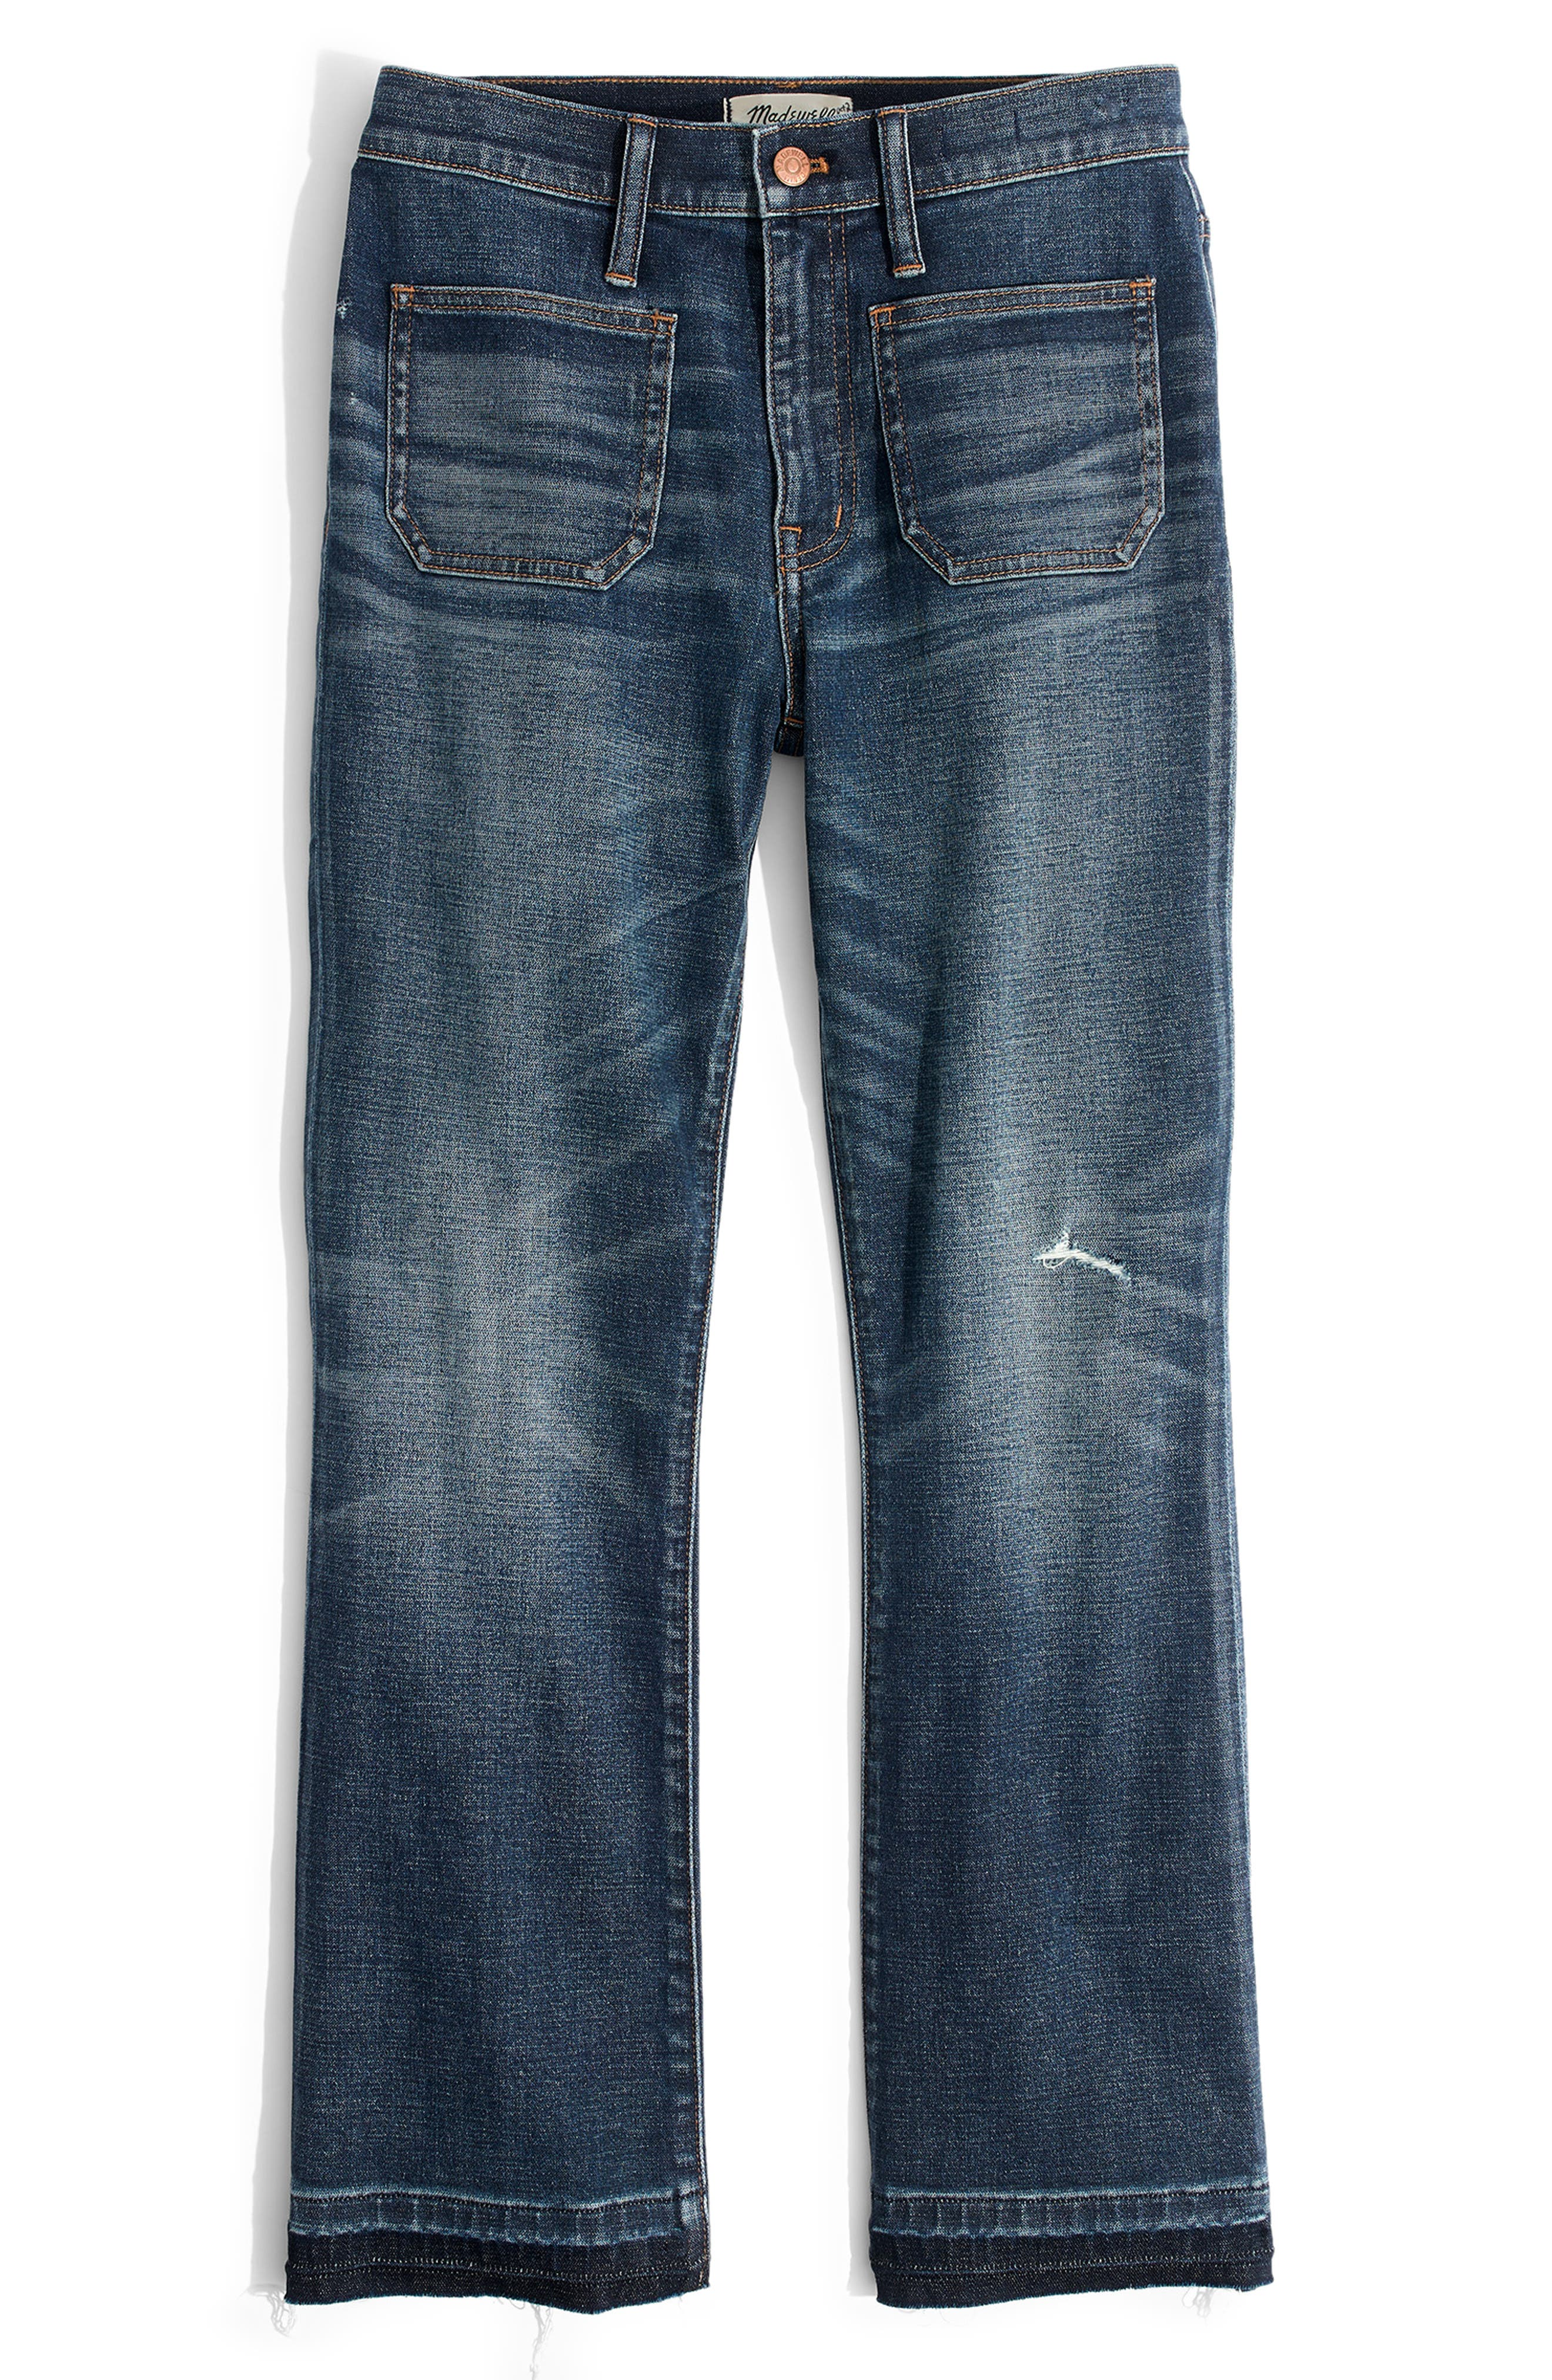 Cali Patch Pocket High Waist Demi Boot Jeans,                             Alternate thumbnail 5, color,                             DERMOTT